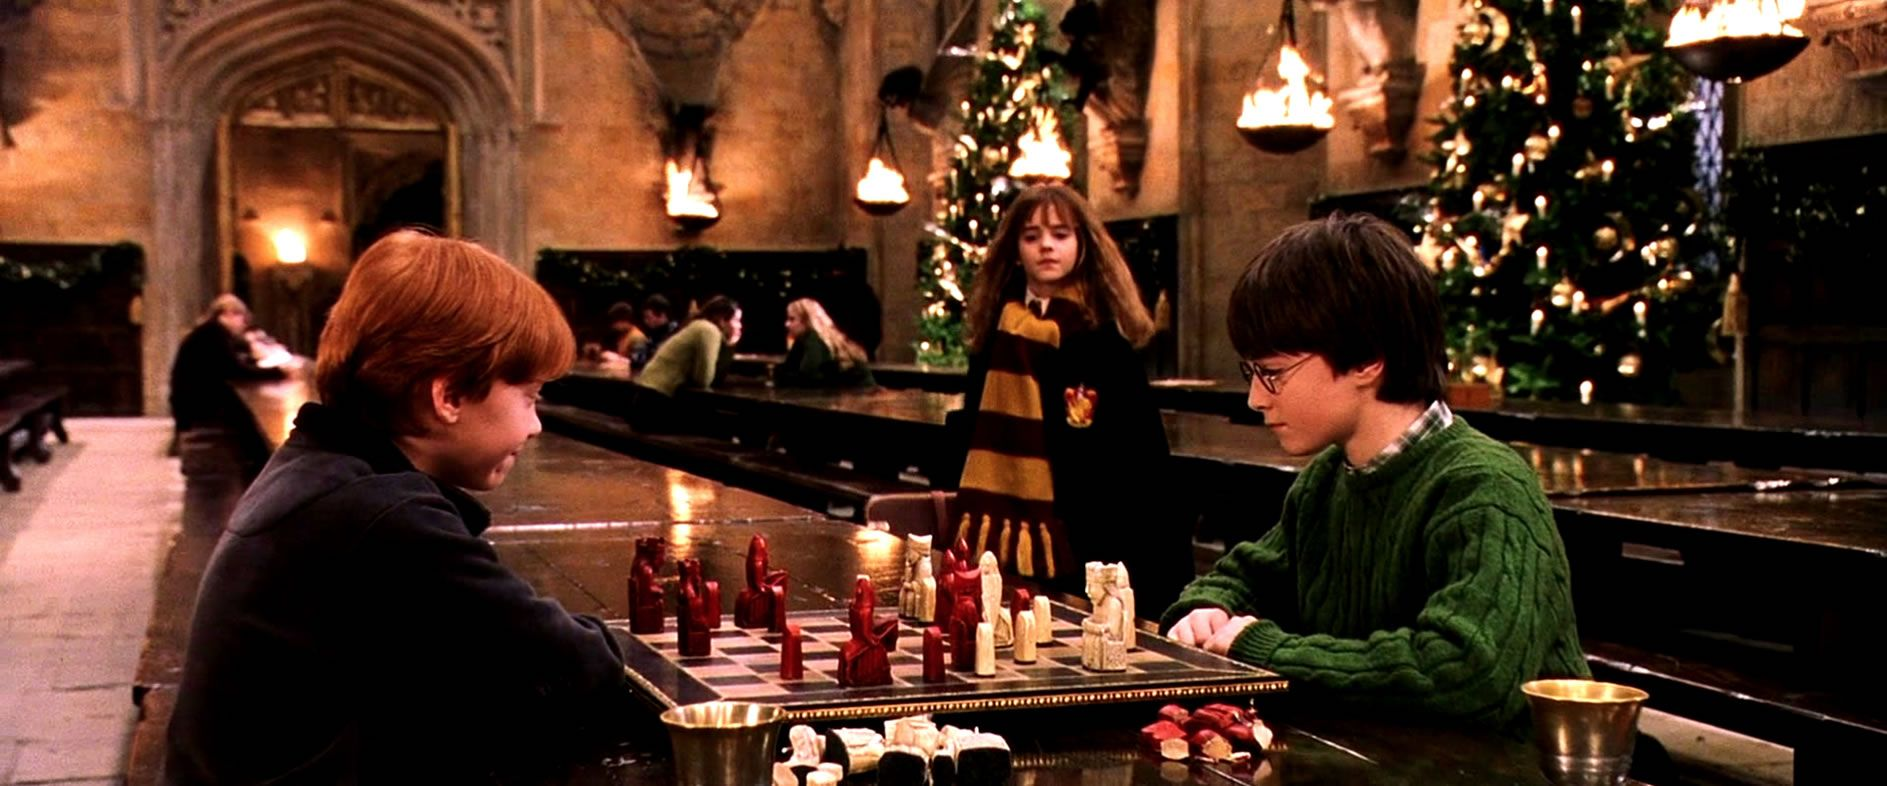 Harry Potter Christmas.Harry Potter Christmas Dinner At Studio Tour Hogwarts Collider